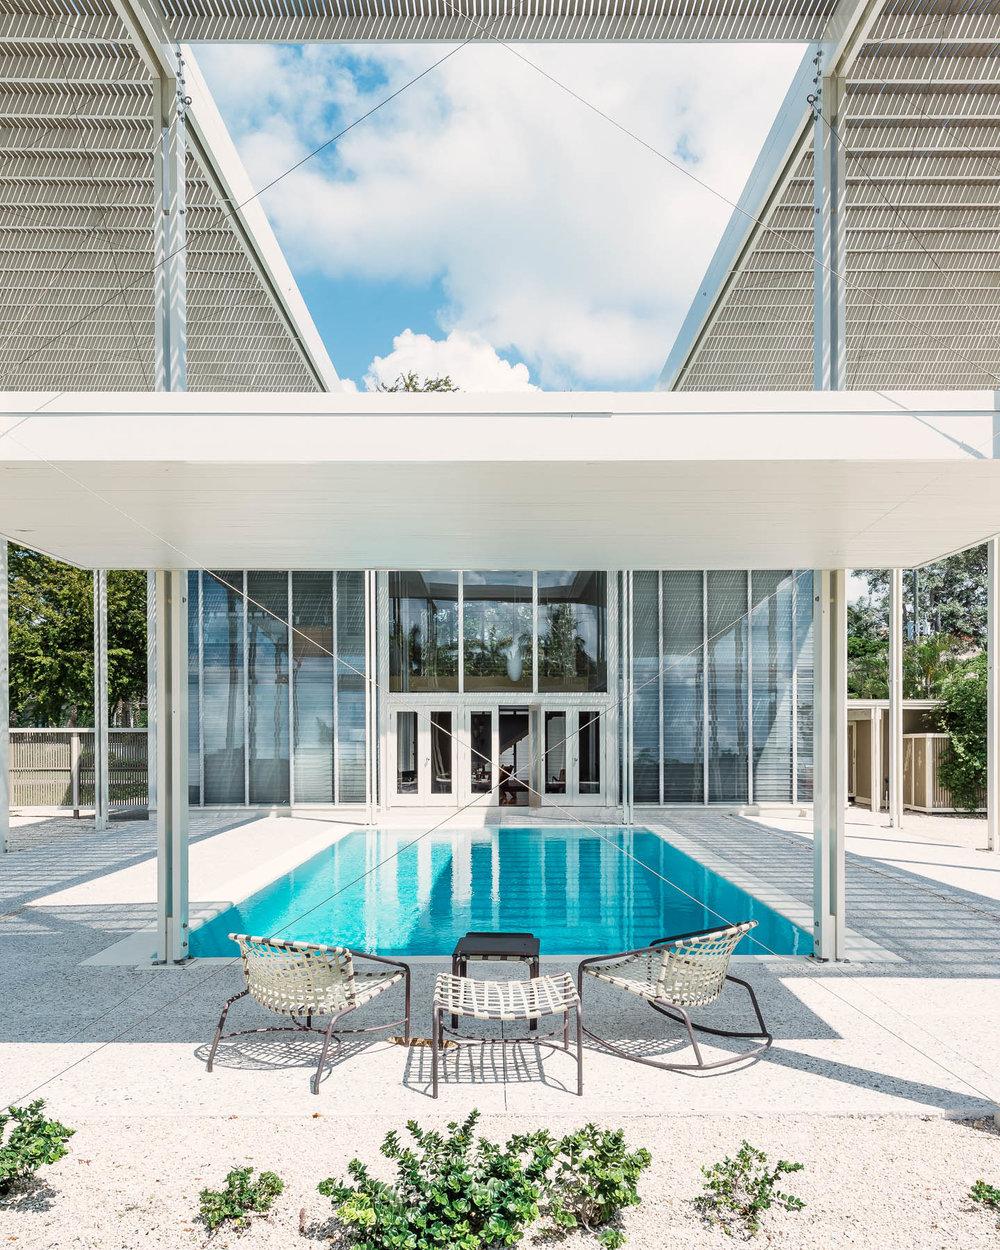 unbrella pool.jpg